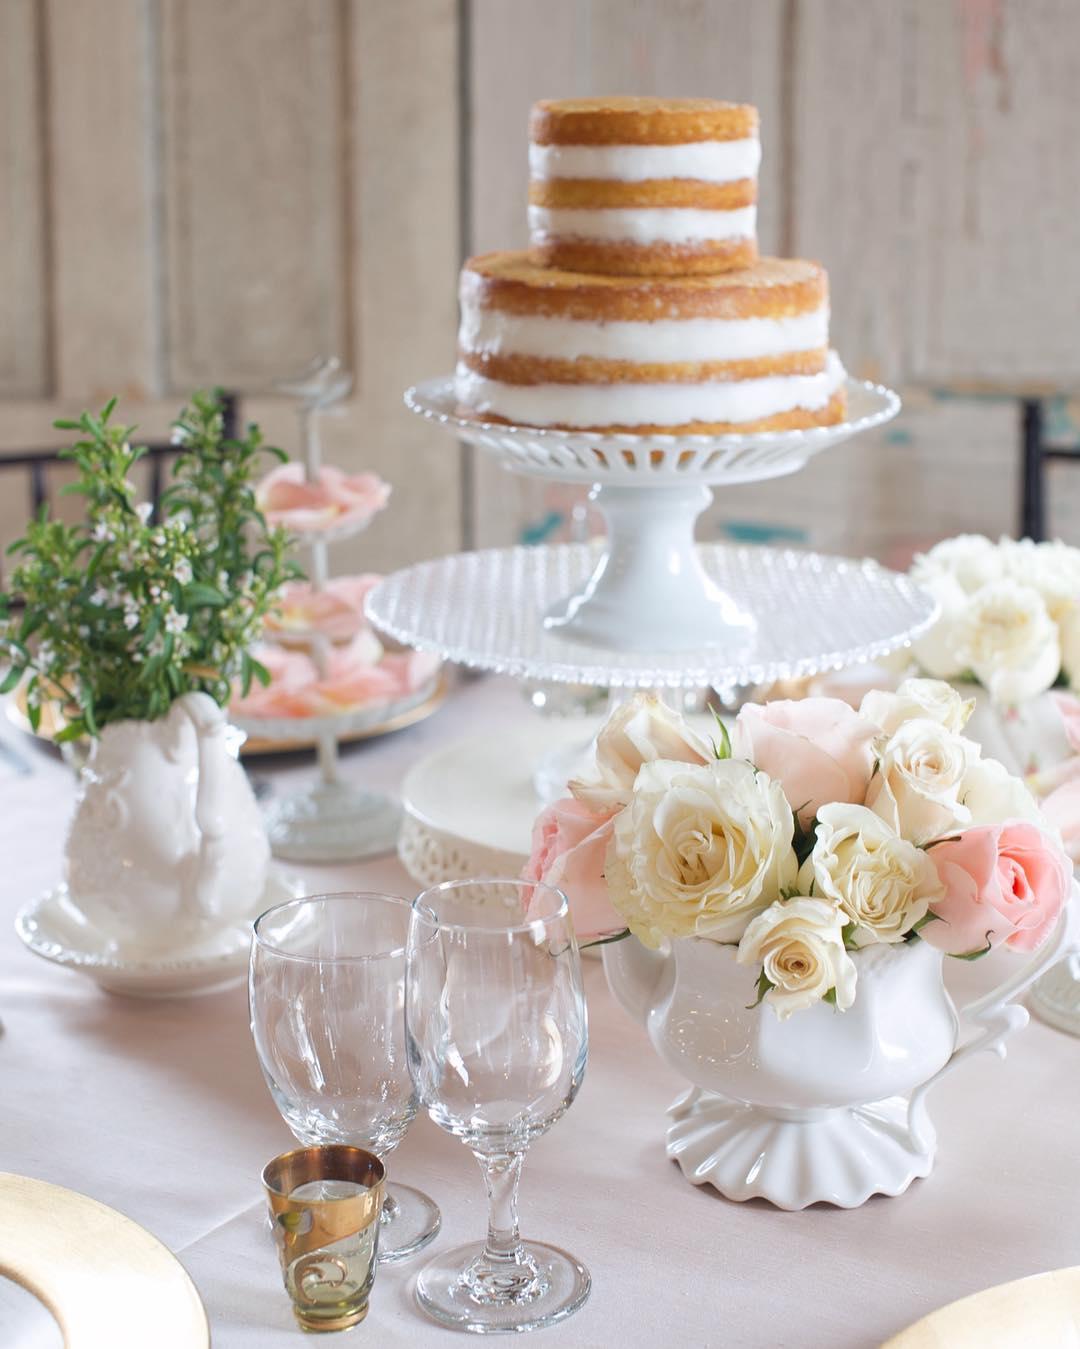 {flowers + cake centerpiece= yes} photo| @simpell_photo_ . . . #centerpiece #cakeandflowers #delicious #pretty #romantic #elegant #classy #roses #photoshoot #getcreative #weddinginspo #lotusfloraldesigns #weddingflorist #weddingflowers #loveflowers